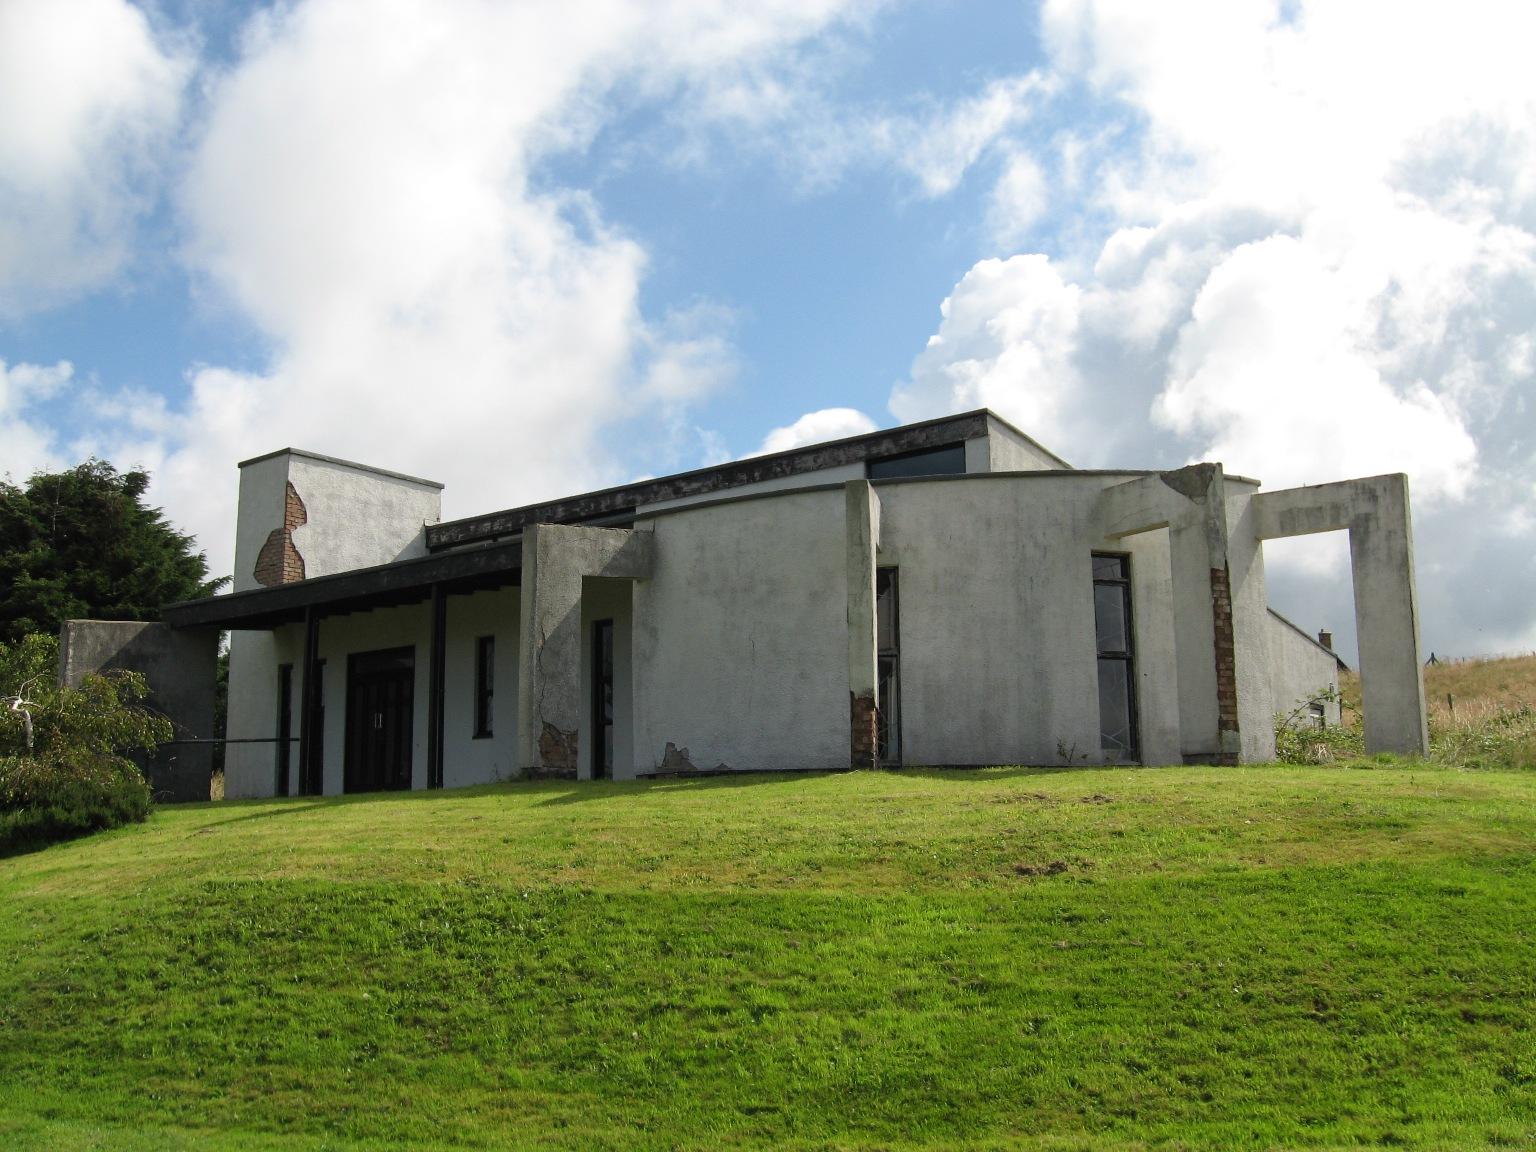 St Winefride's Church